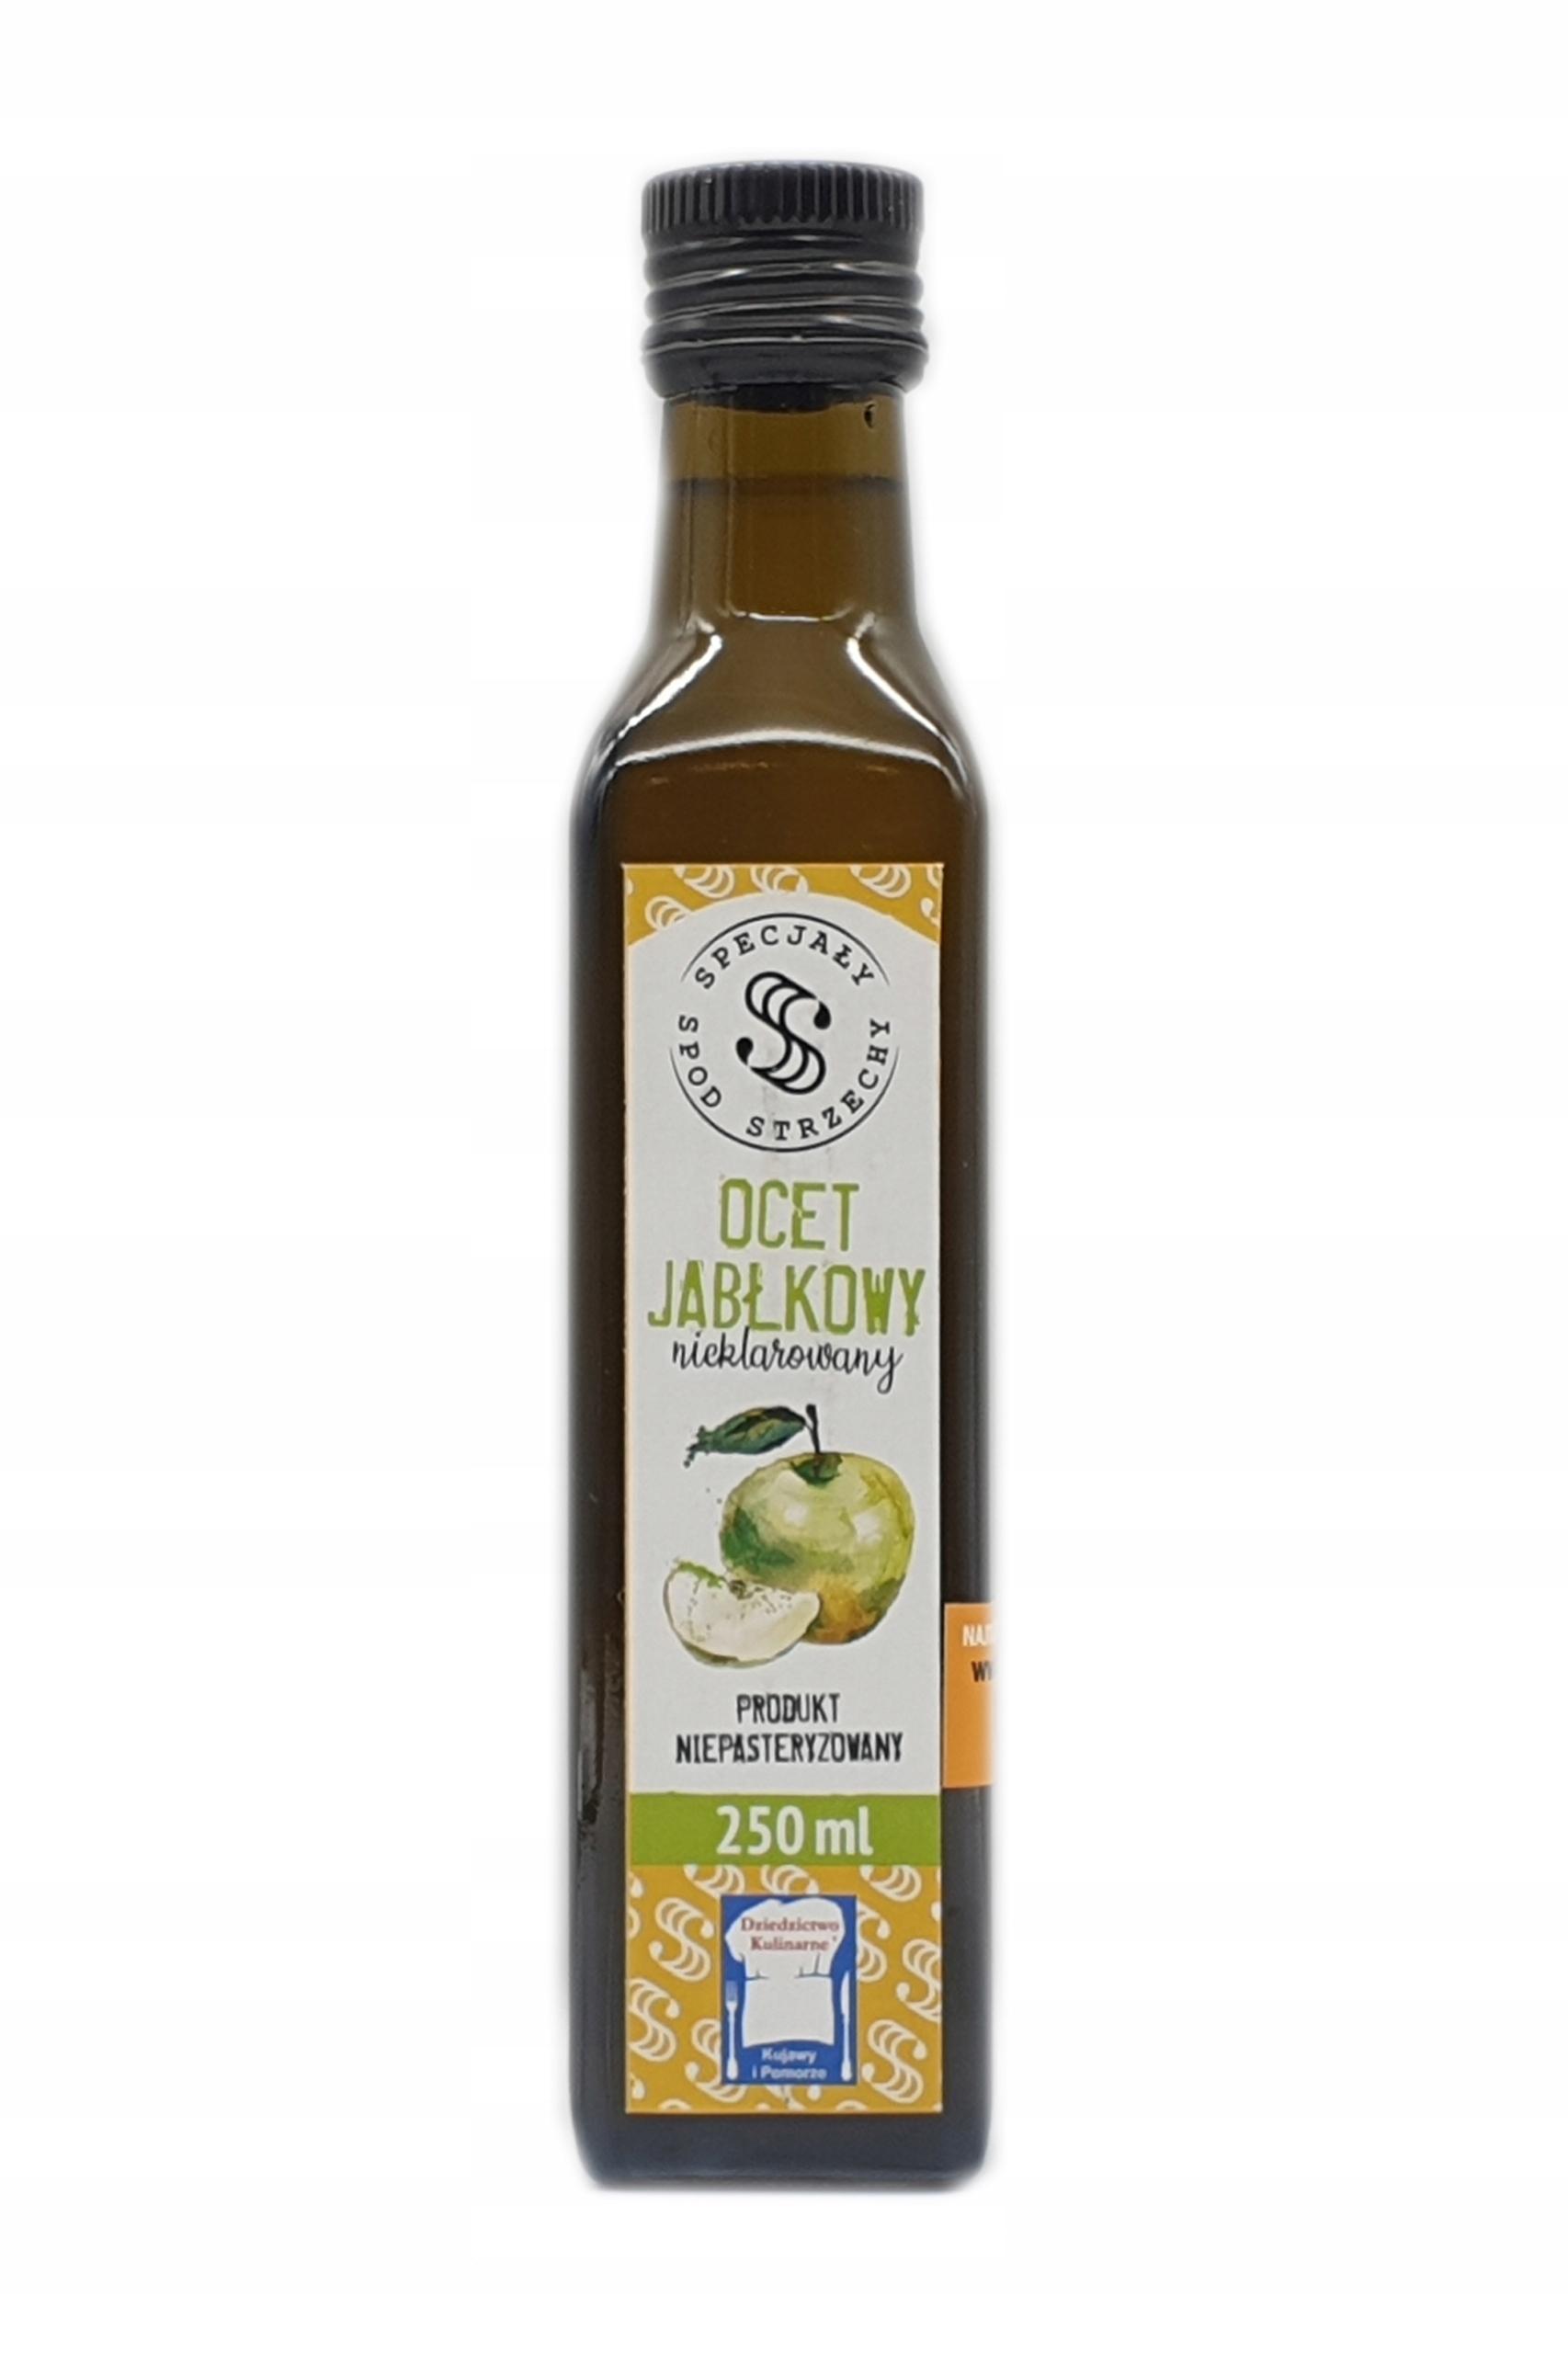 Ocet Jabłkowy (ocet owocowy) - 250 ml